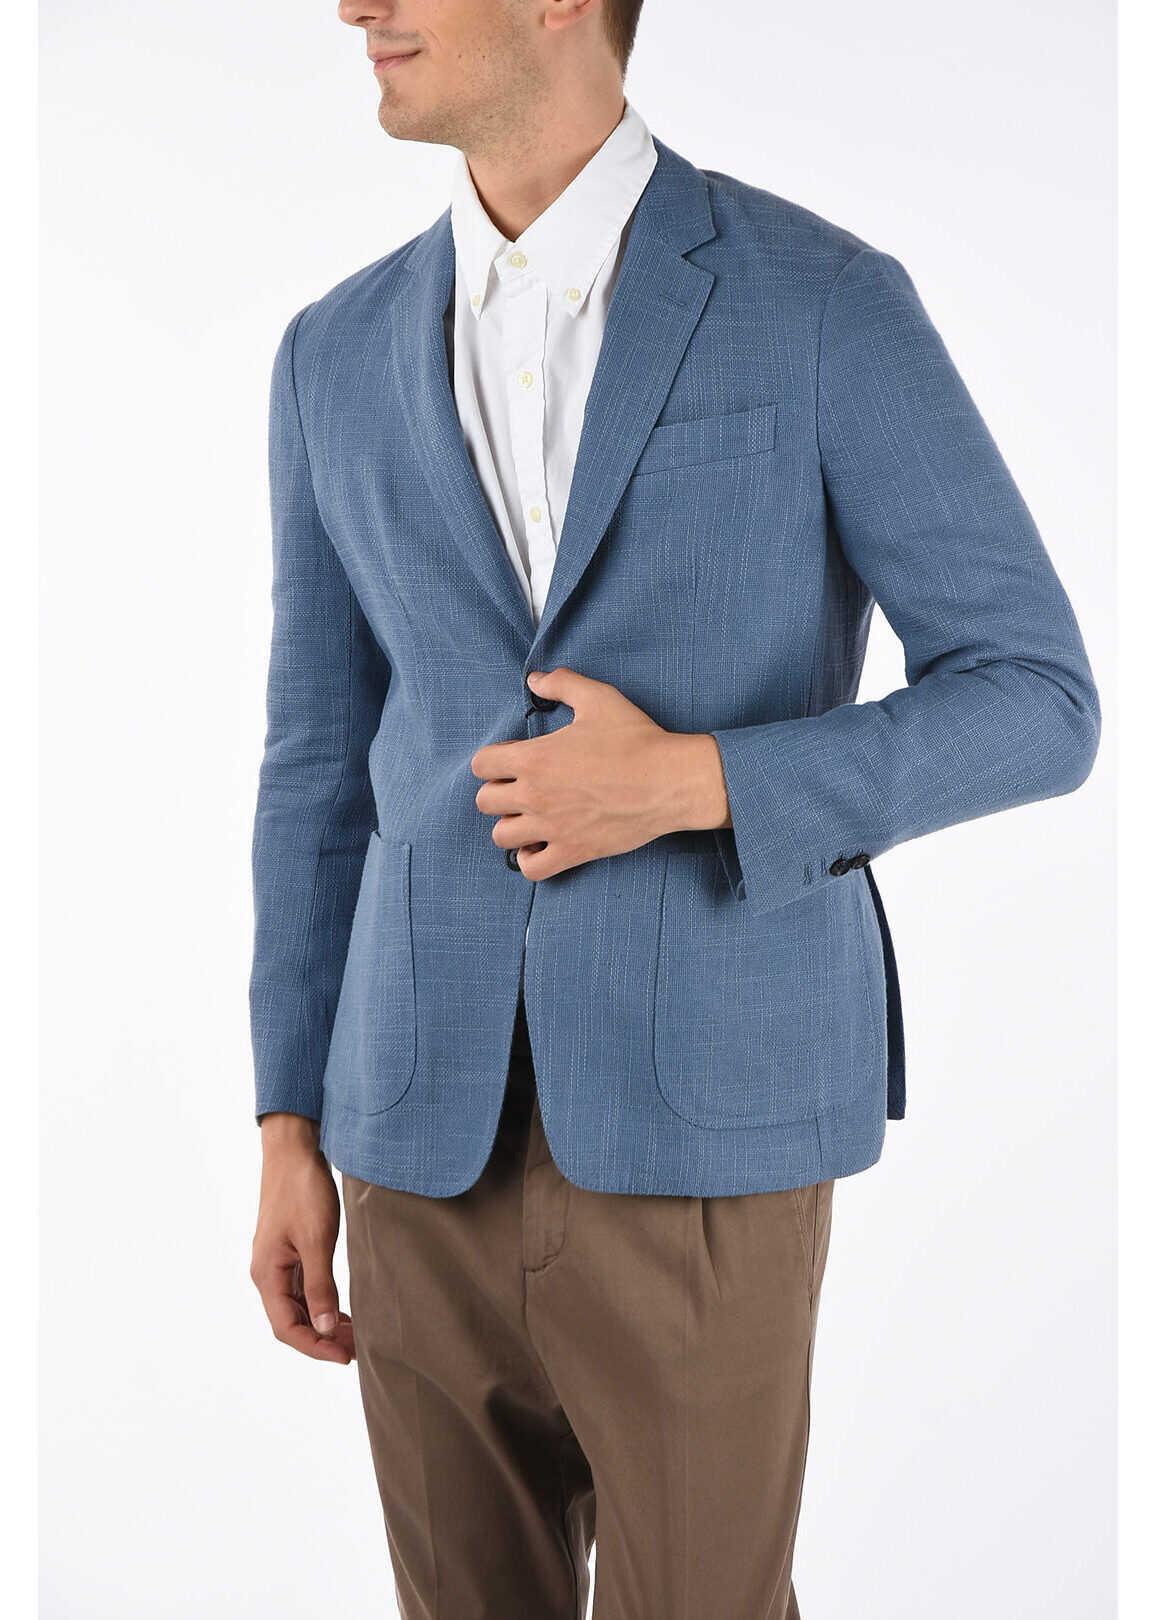 CORNELIANI ID hopsack patch pocket 2-button blazer LIGHT BLUE imagine